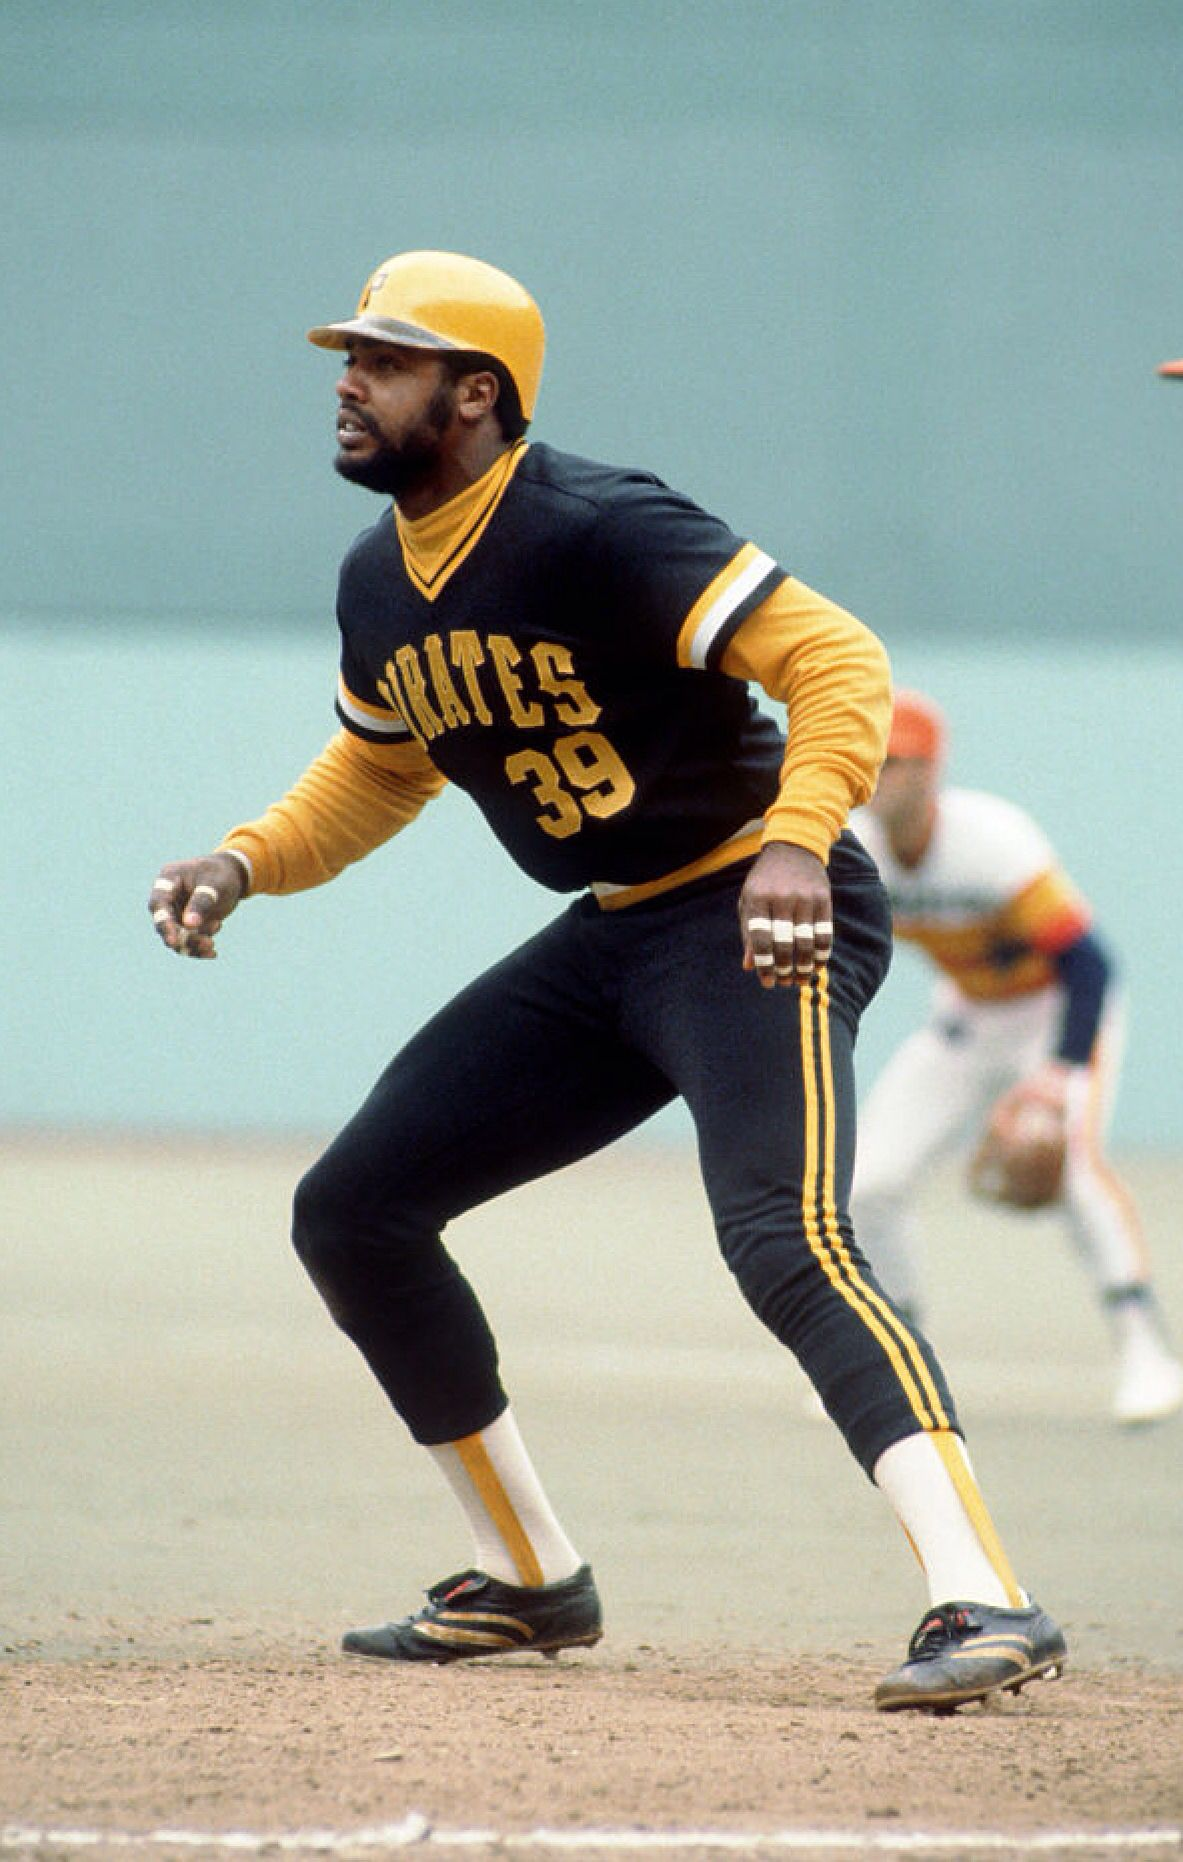 b23a7c7aa63 Dave Parker Pro Baseball, Baseball Uniforms, Sports Uniforms, Baseball  Cards, Mlb Pirates